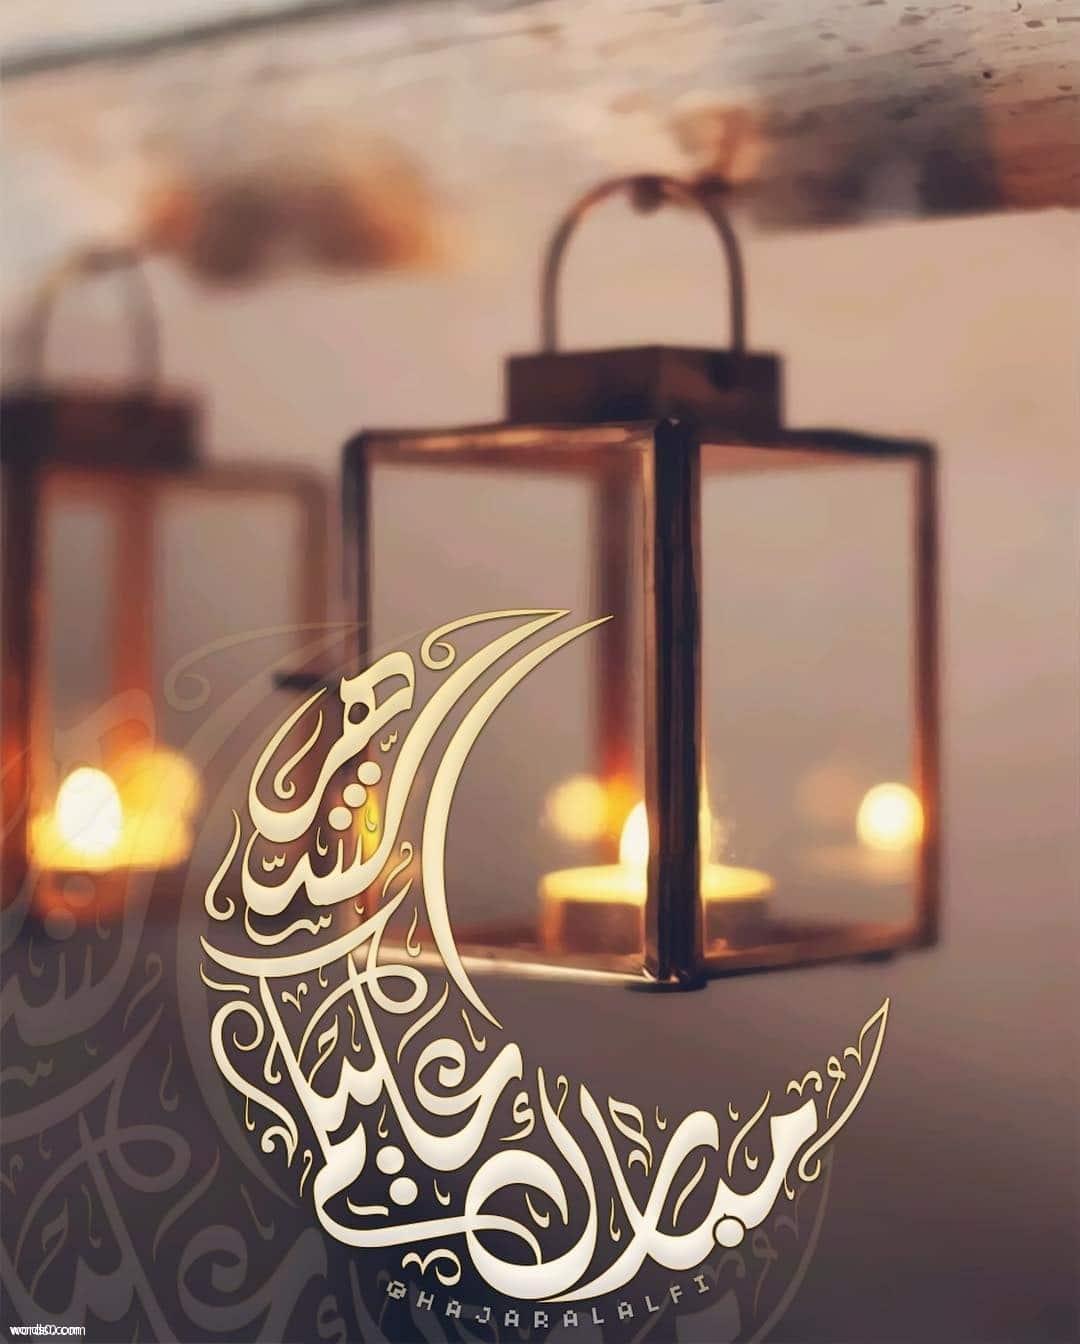 صور رمضان 2020 أجمل صور فوانيس رمضان 2021 بطاقات تهنئة لرمضان تهنئة رمضان بالأسماء 14